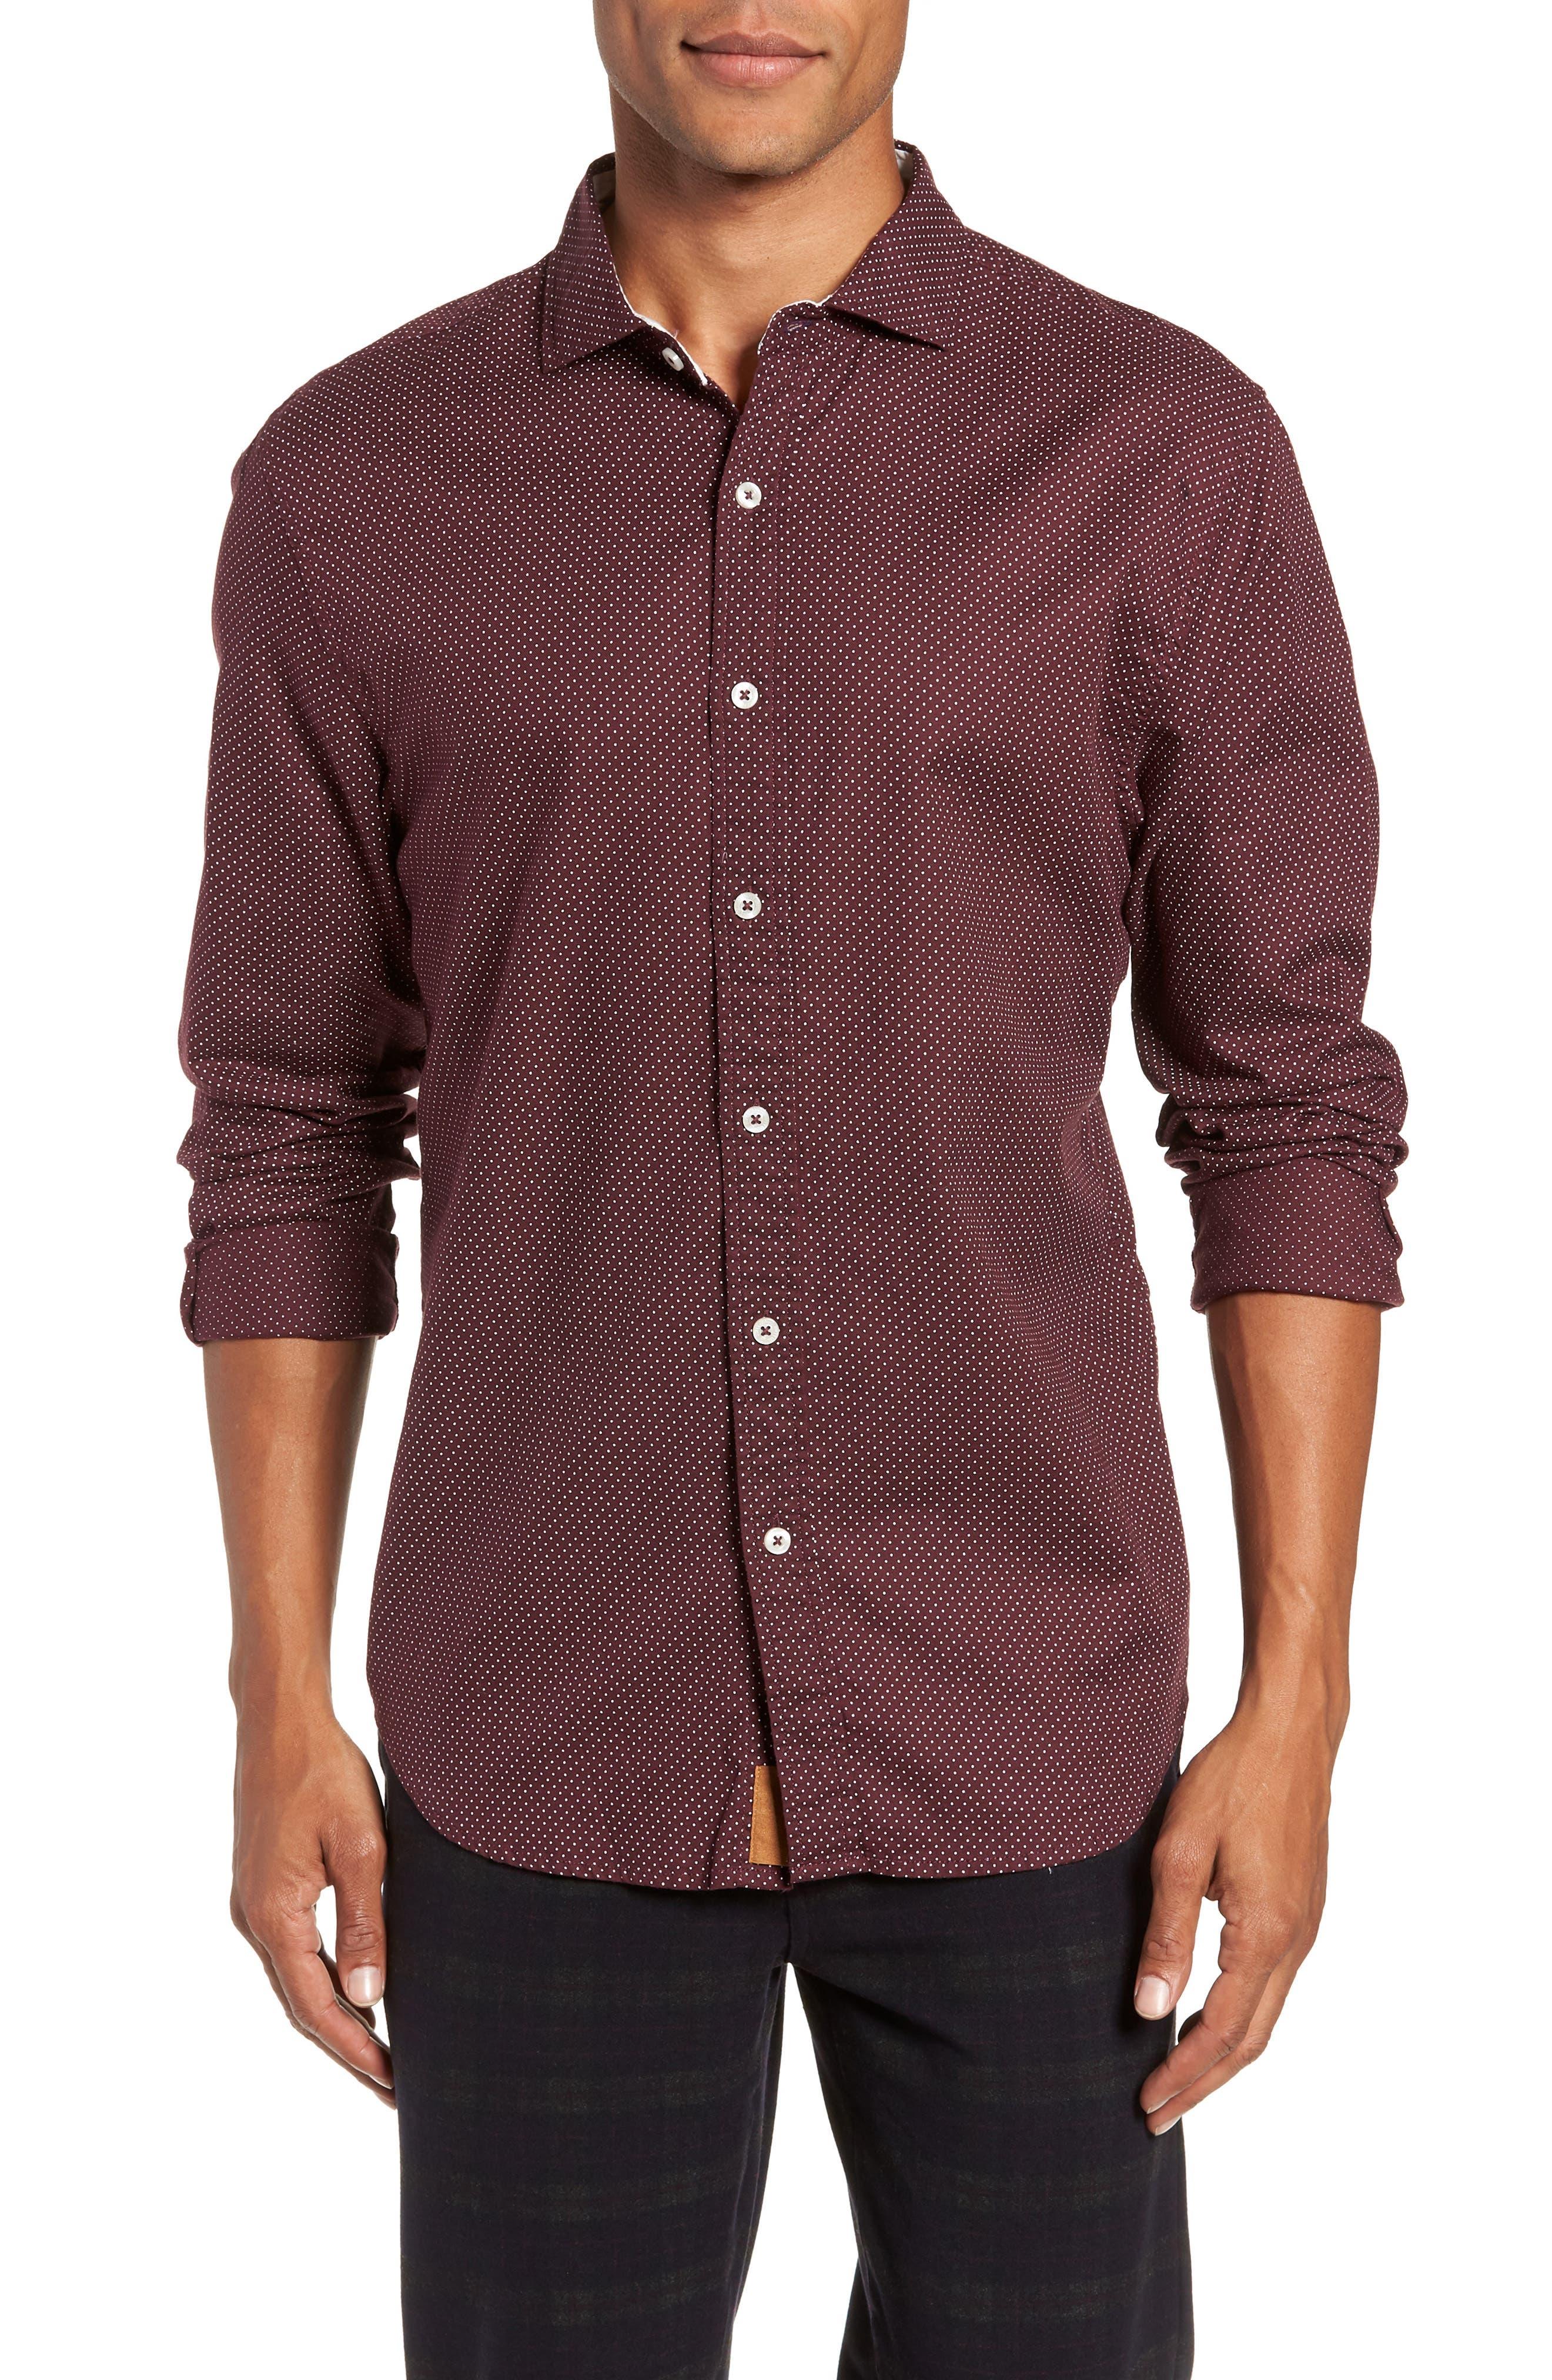 Earnest Regular Fit Dotted Sport Shirt,                             Main thumbnail 1, color,                             BURGUNDY